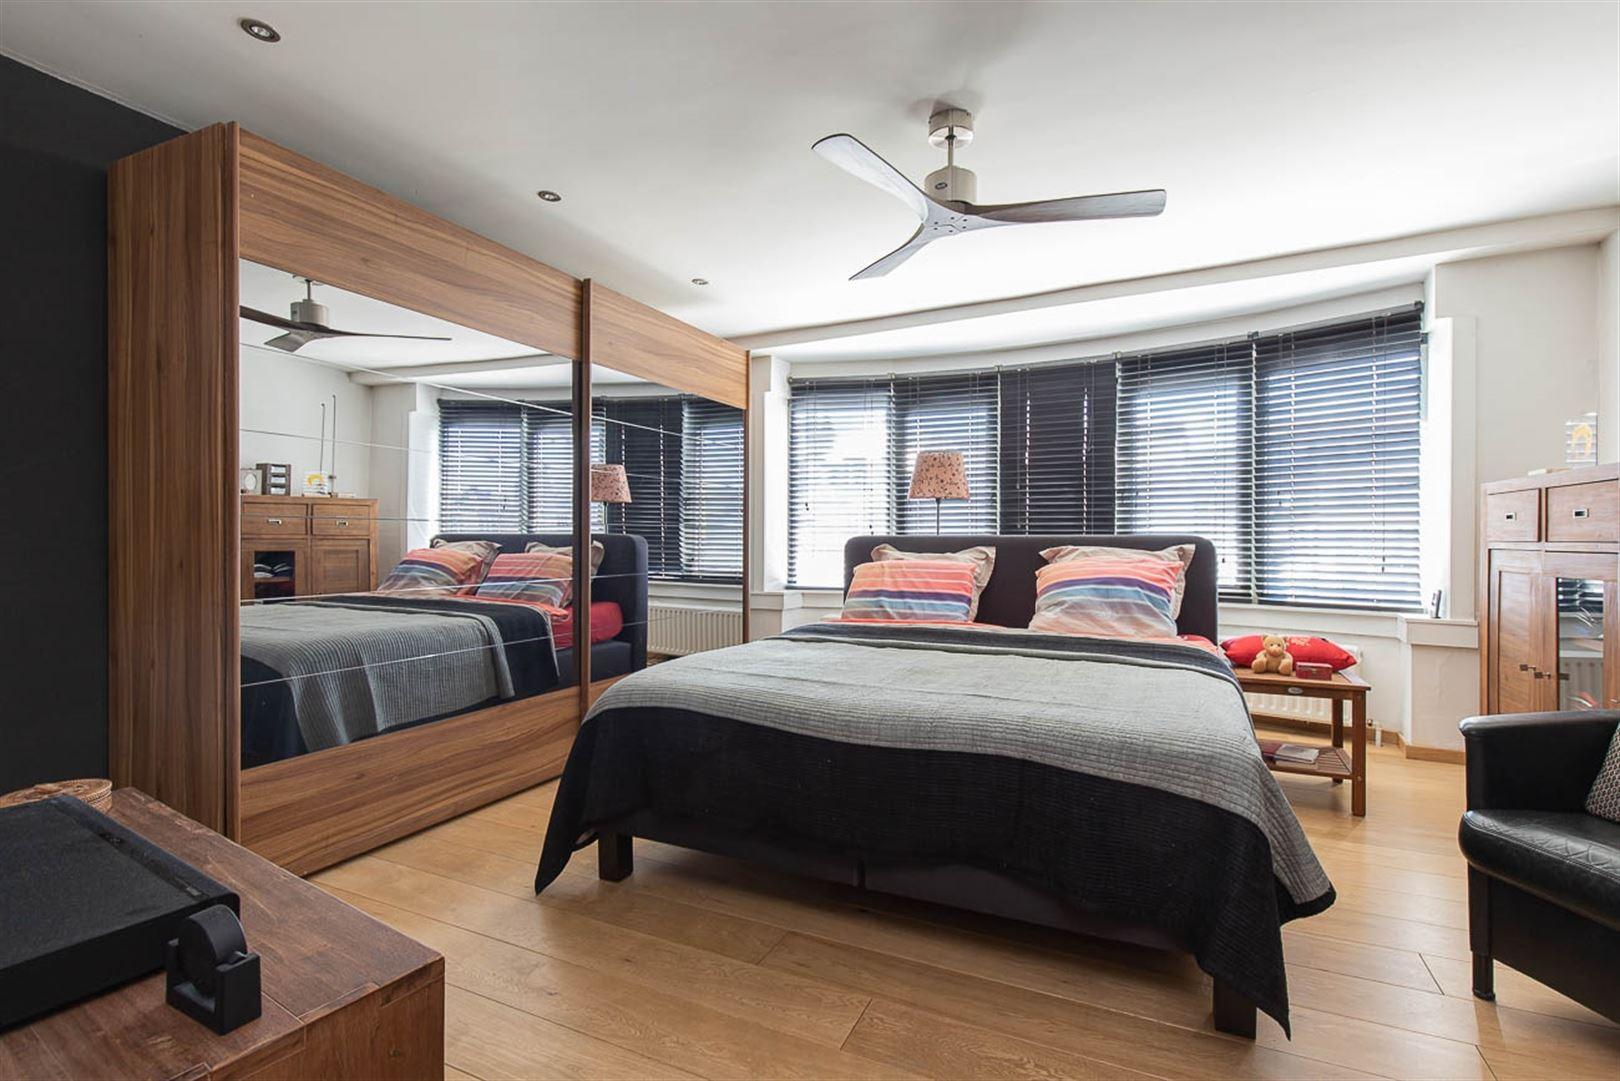 Foto 21 : Duplex/triplex te 9200 DENDERMONDE (België) - Prijs € 495.000